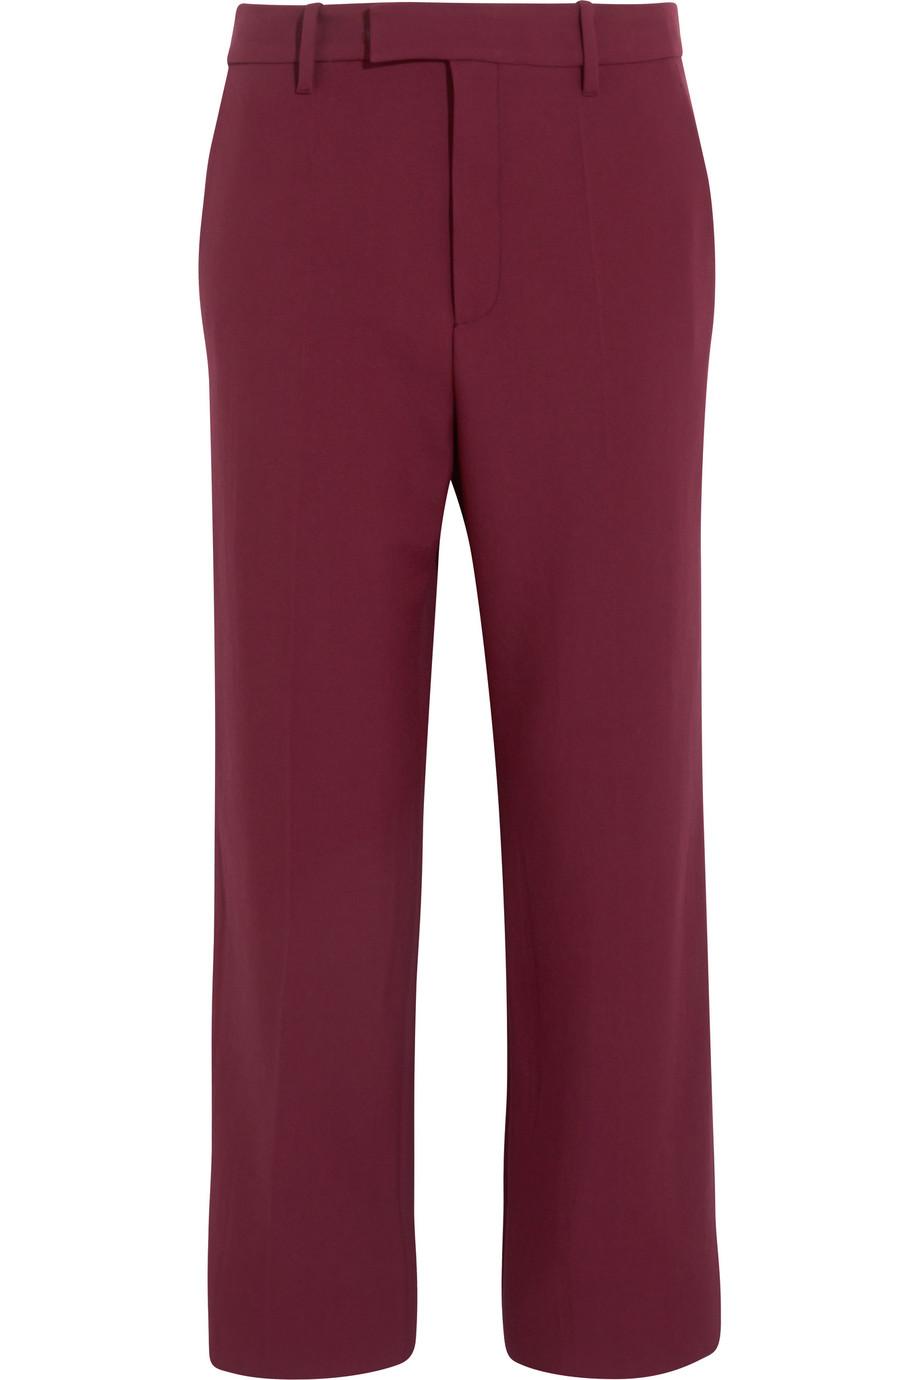 Gucci Wool Straight-Leg Pants, Claret, Women's, Size: 38